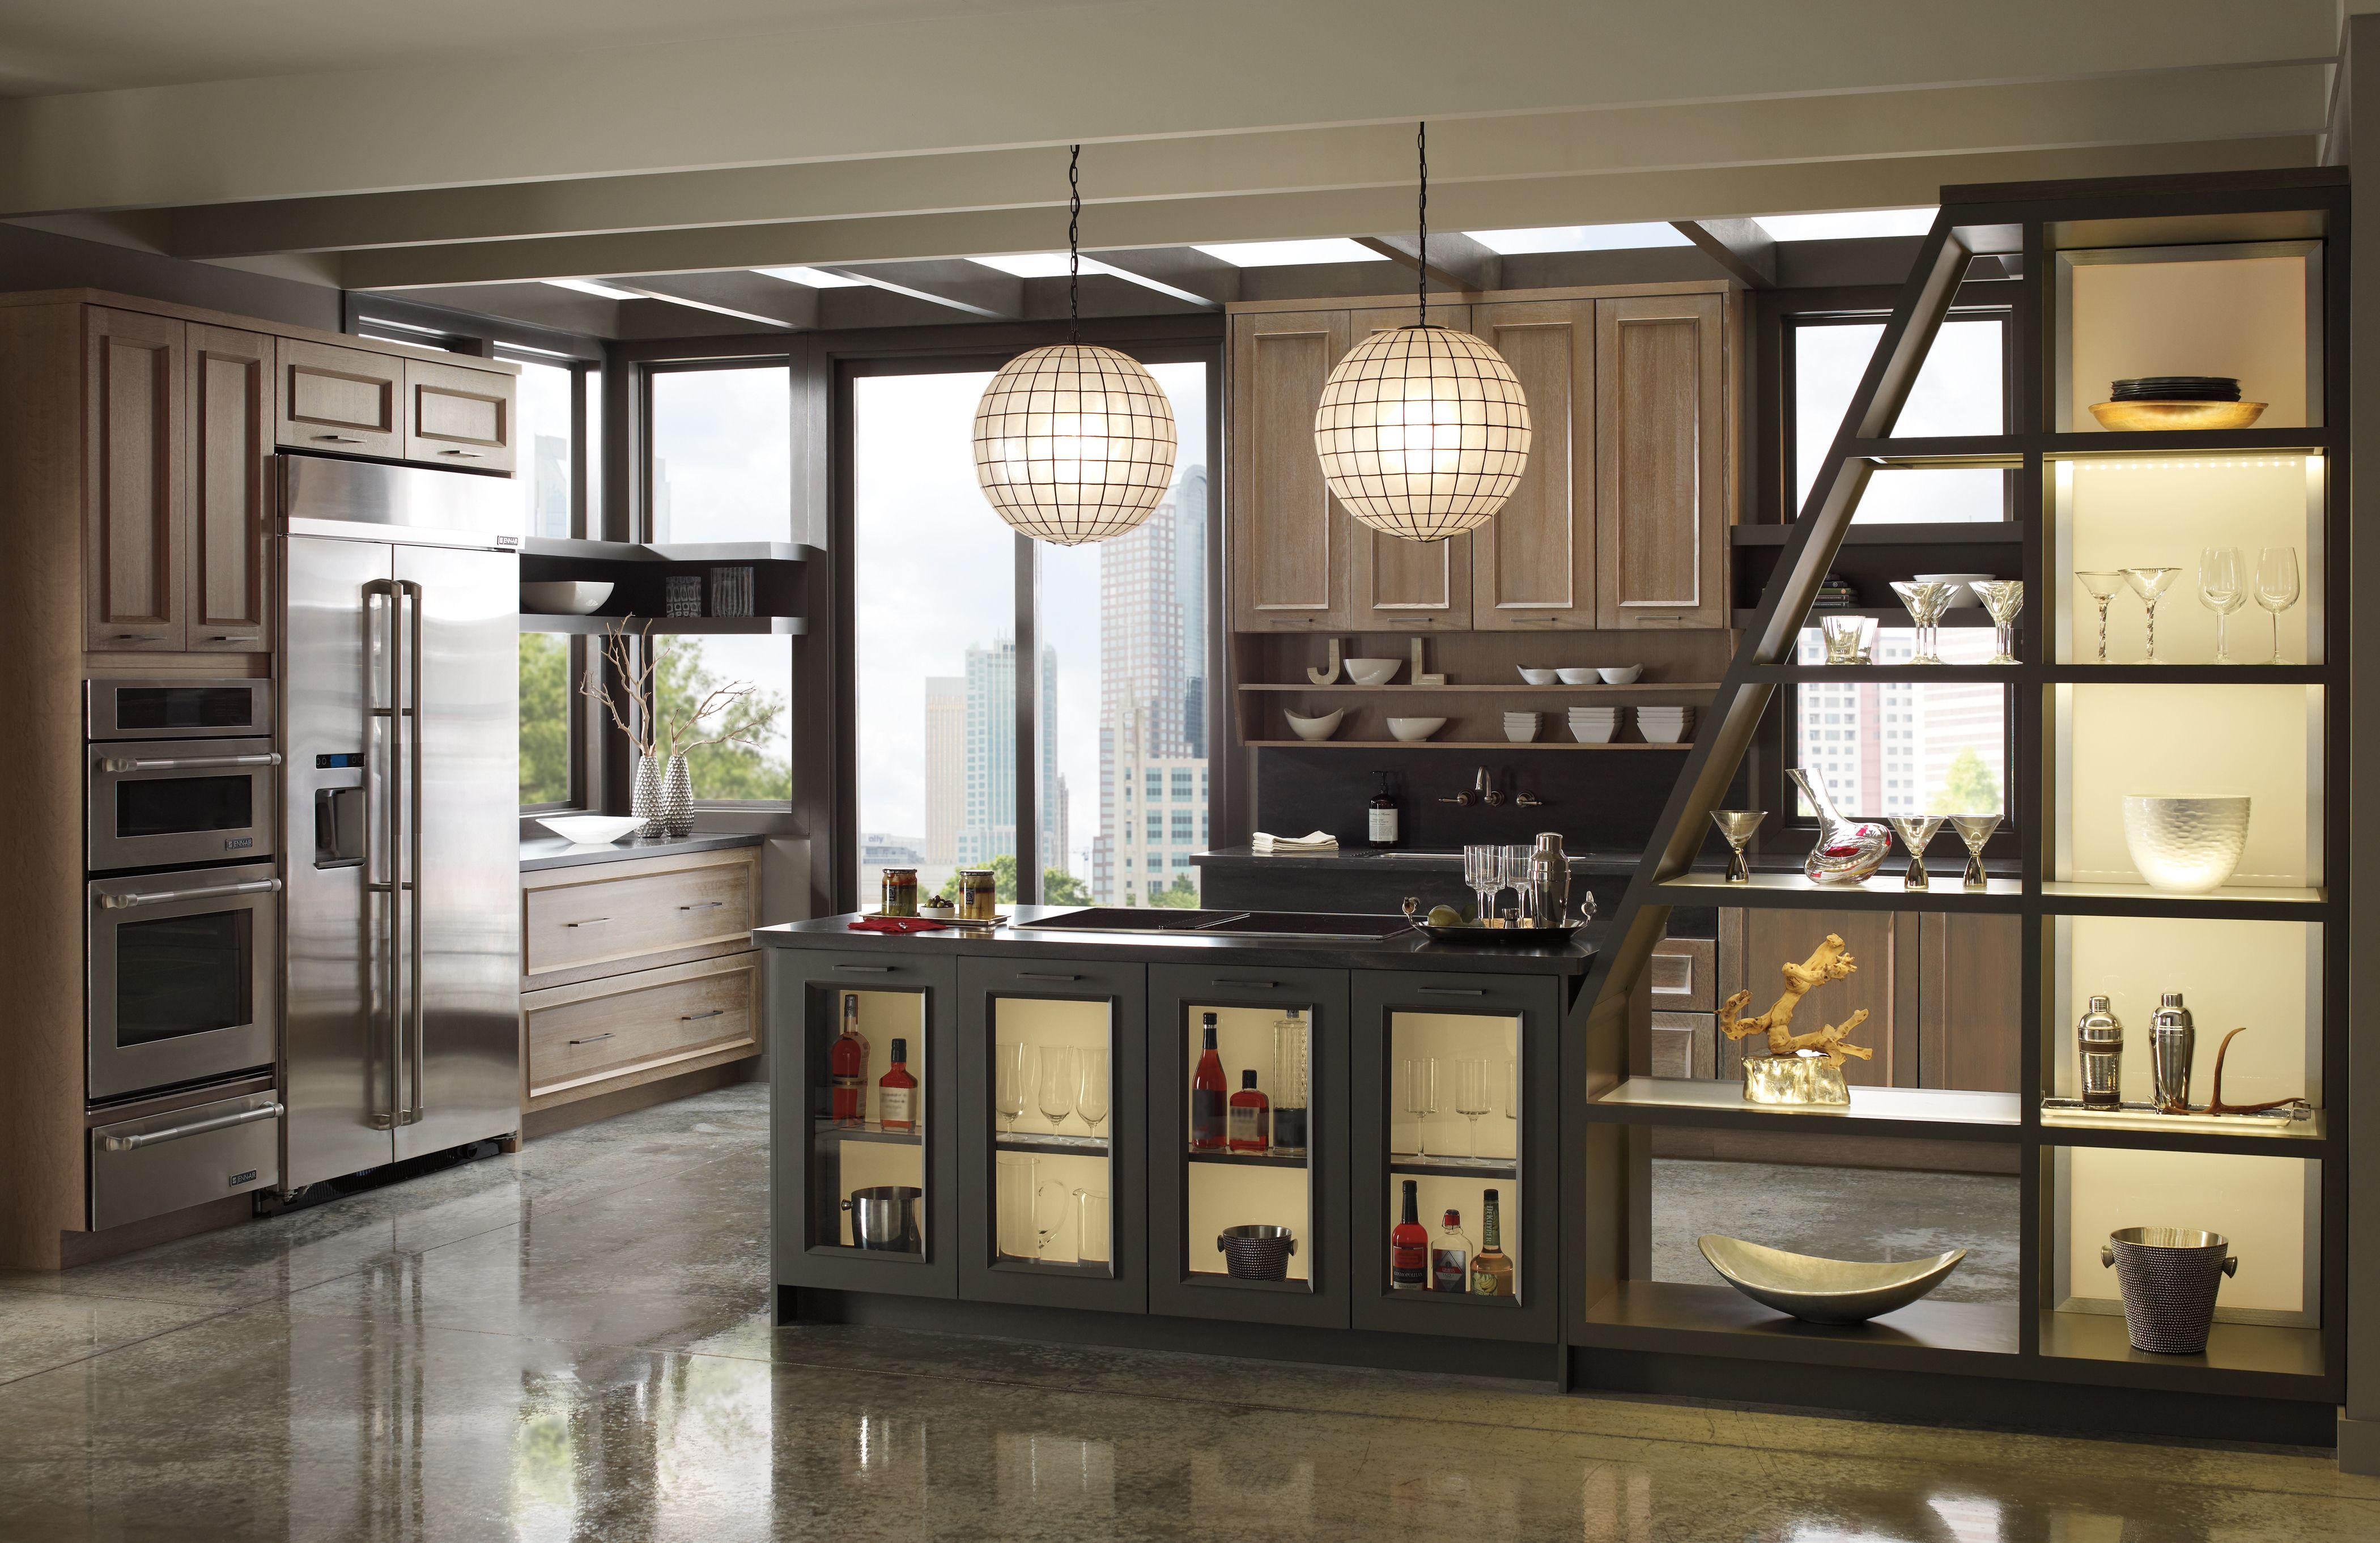 Modern Kitchen And Bathroom Design Trends For 2017  Elevations Best Kitchen Design Latest Trends Inspiration